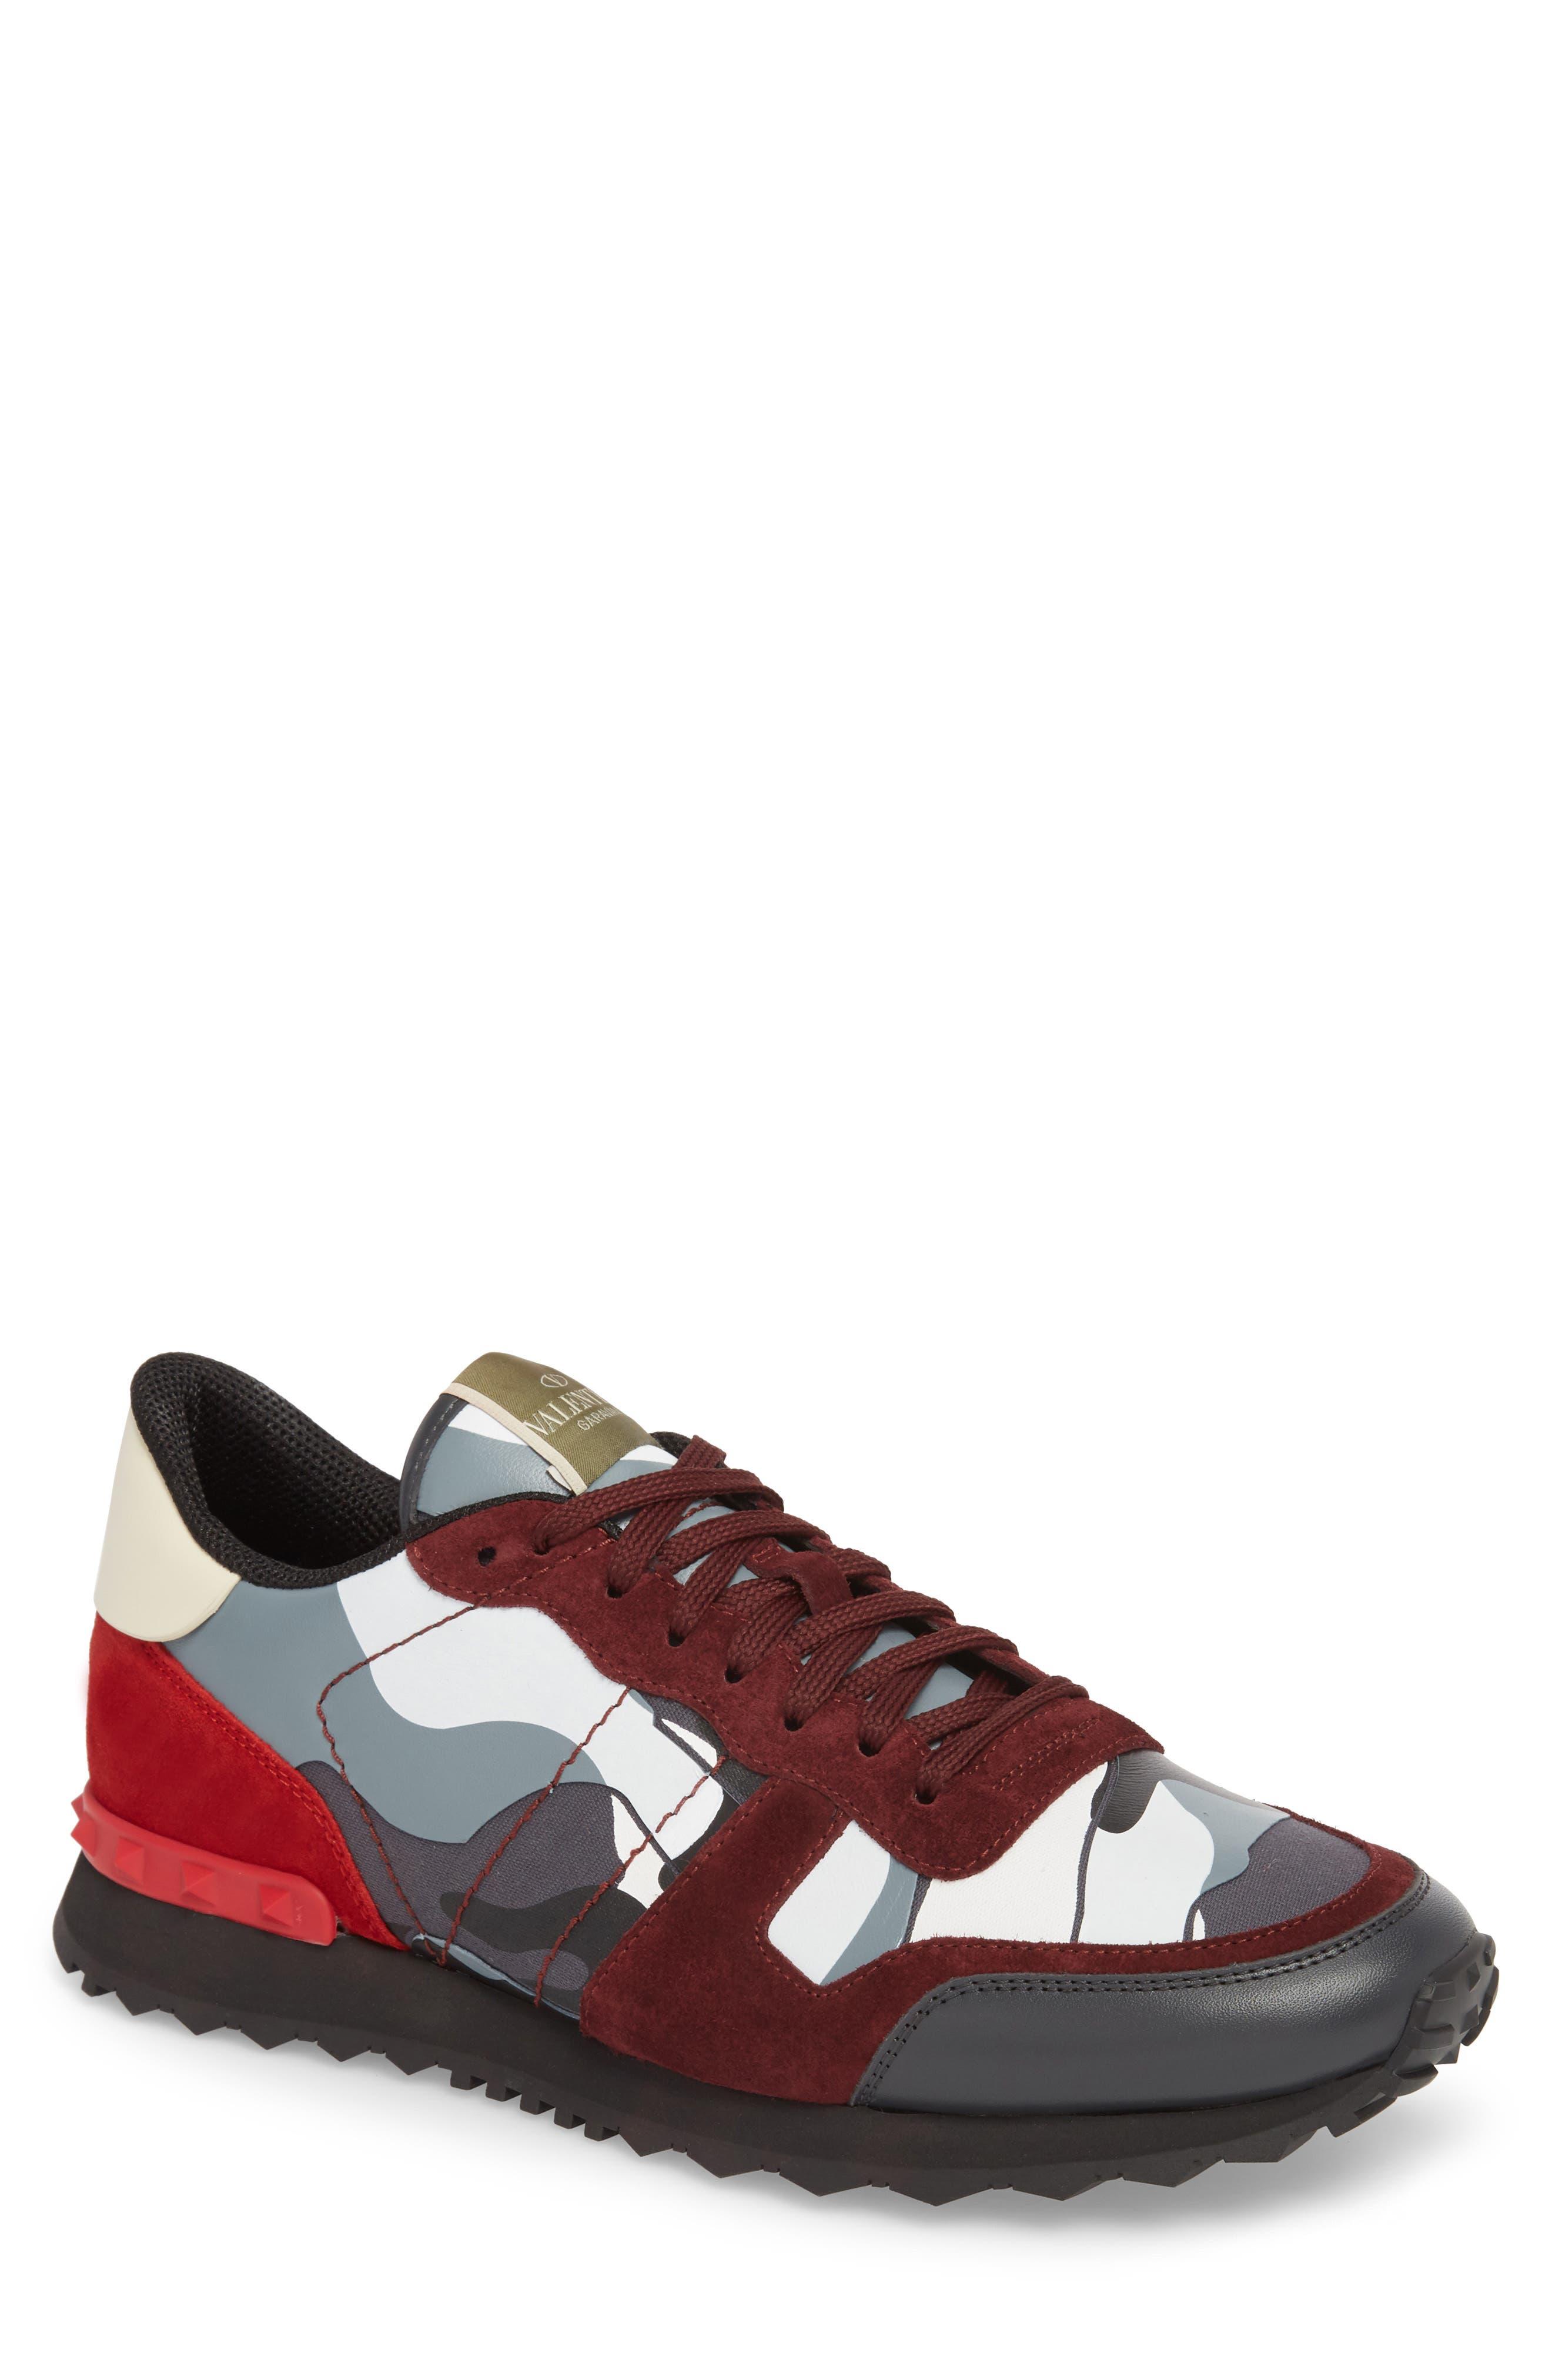 Camo Rockrunner Sneaker,                             Main thumbnail 1, color,                             Rubin/ Dark Grey